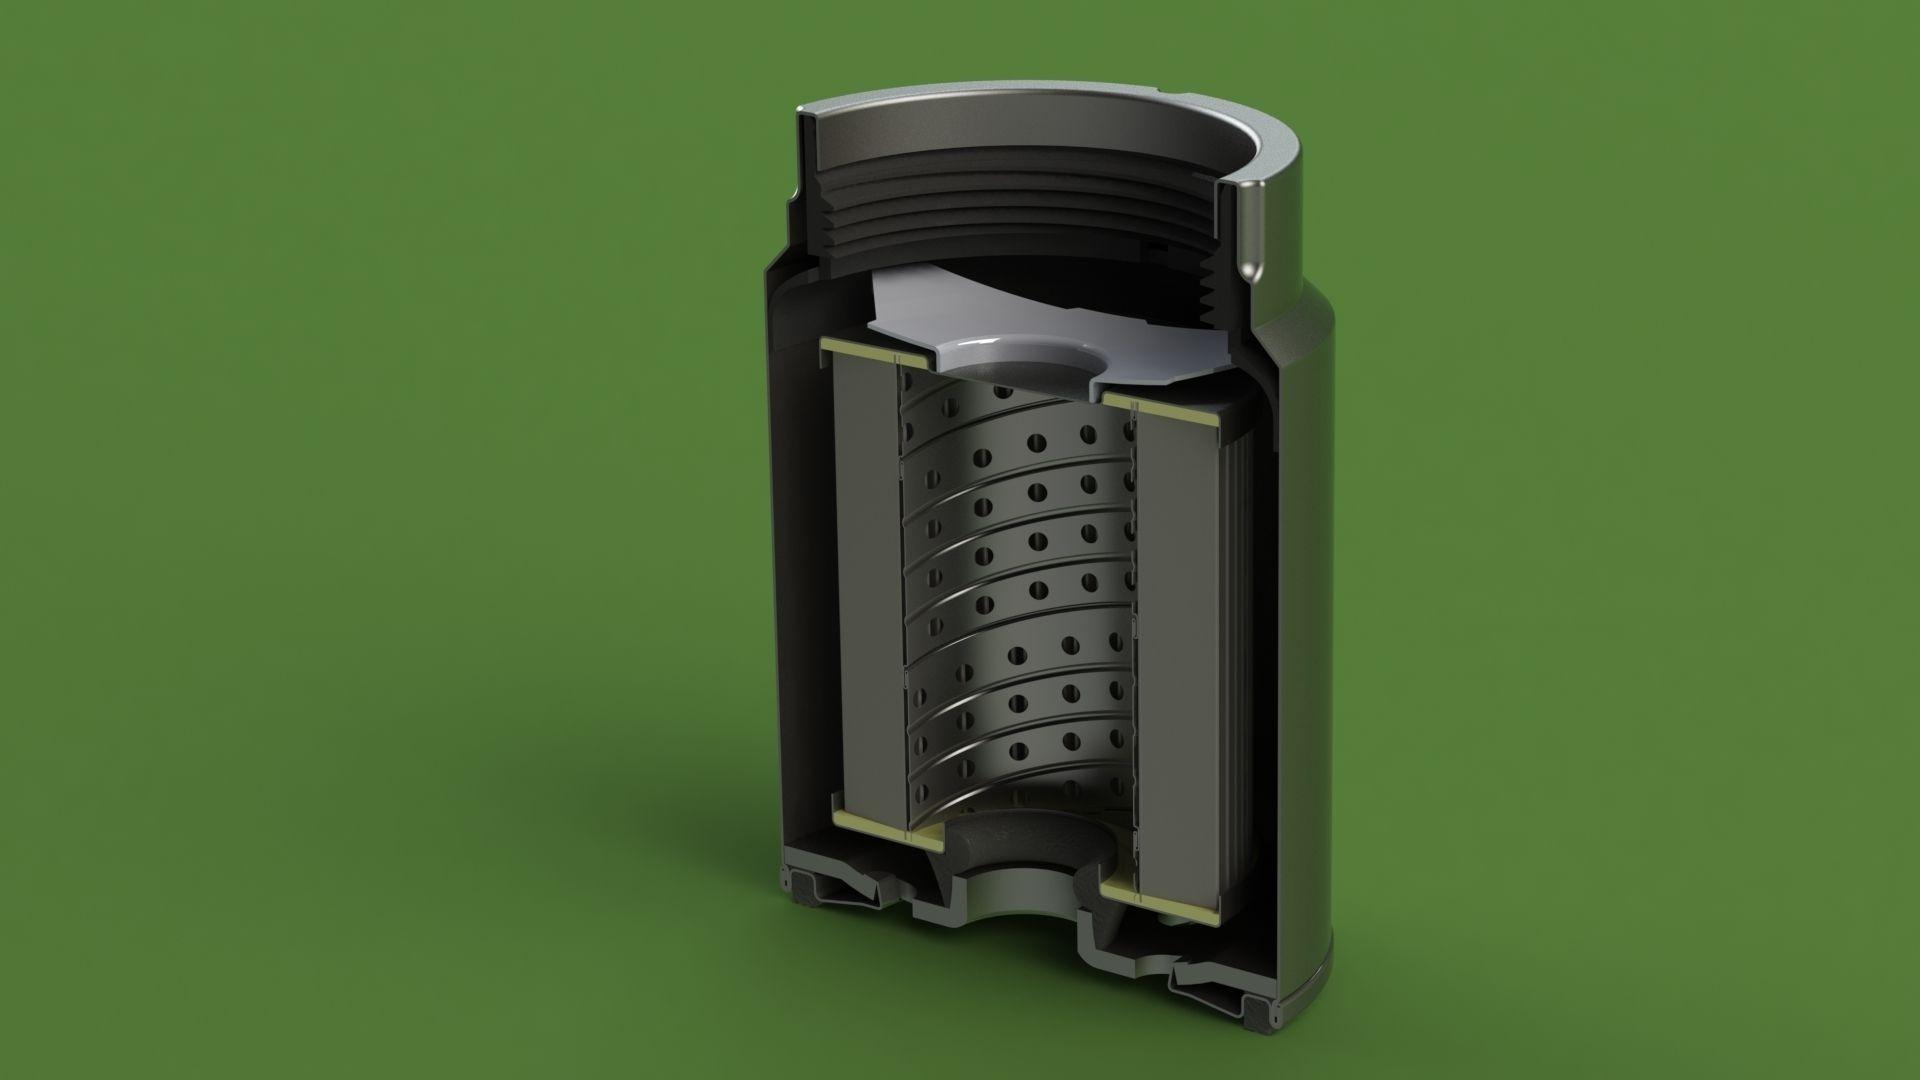 mann pl270 disel fuel filter 3d model sldprt sldasm slddrw 1 ...